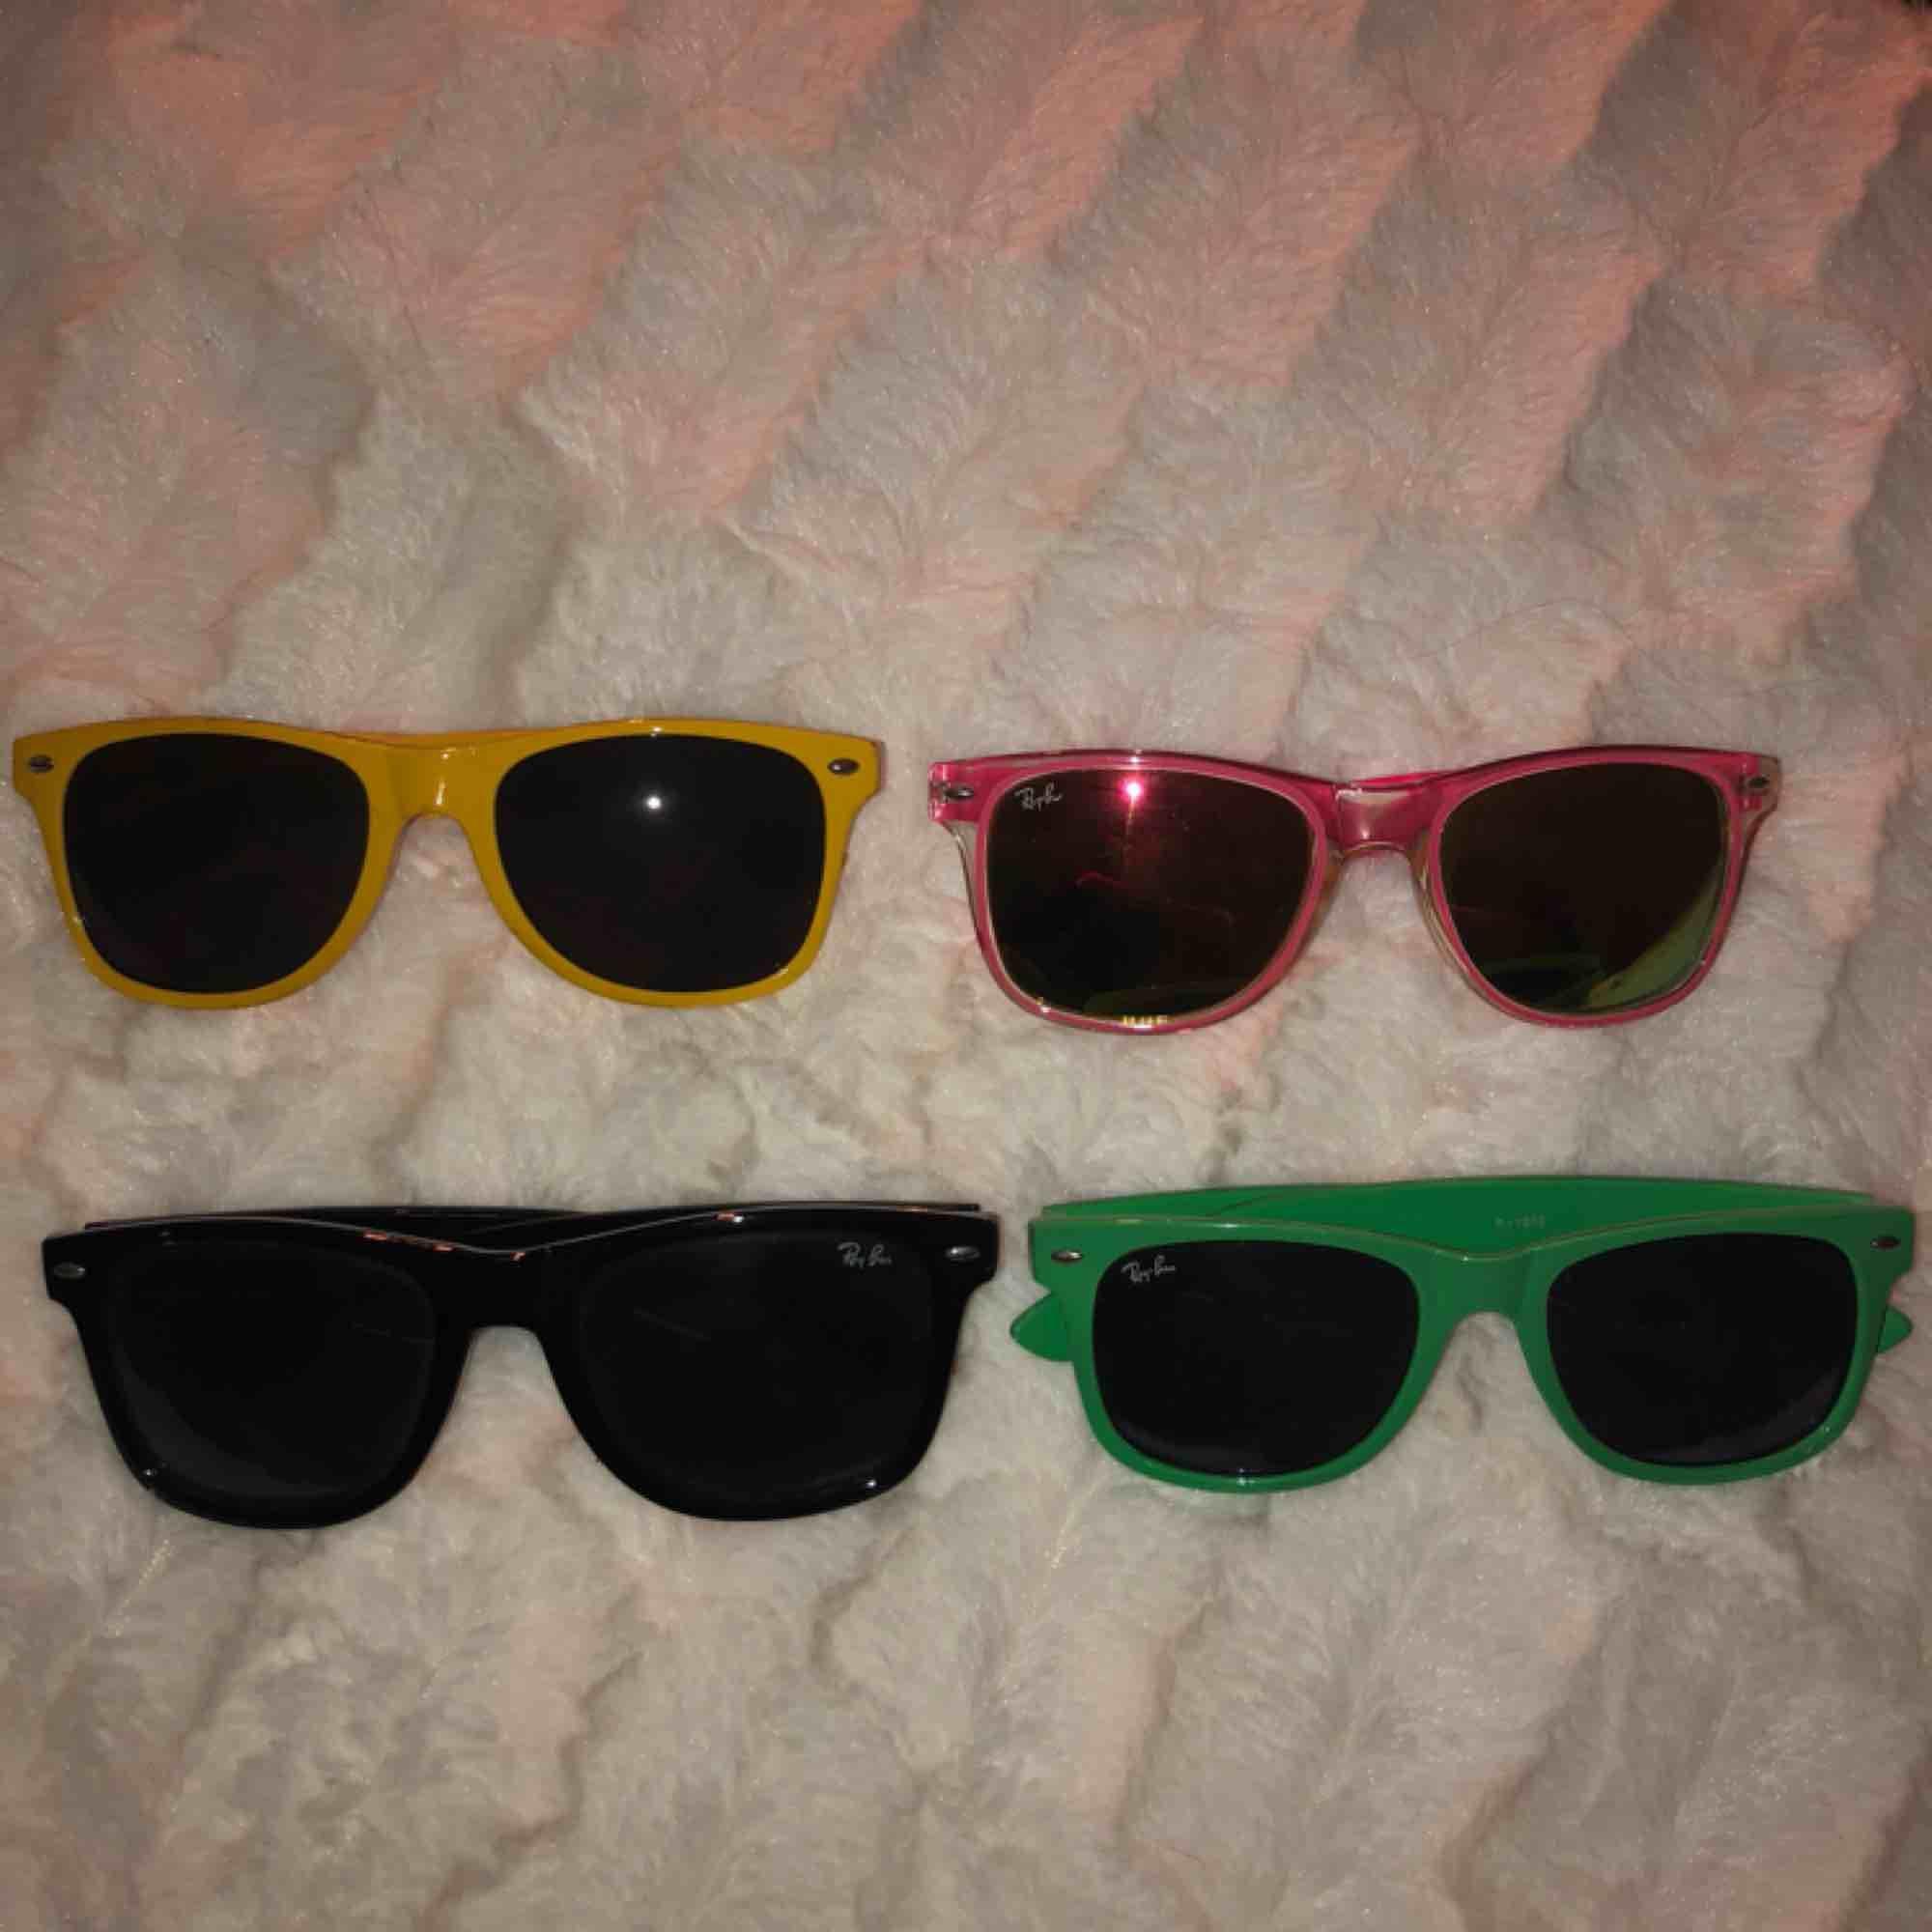 Fake Ray-Ban solglasögon i bra skick, 29kr st!. Accessoarer.